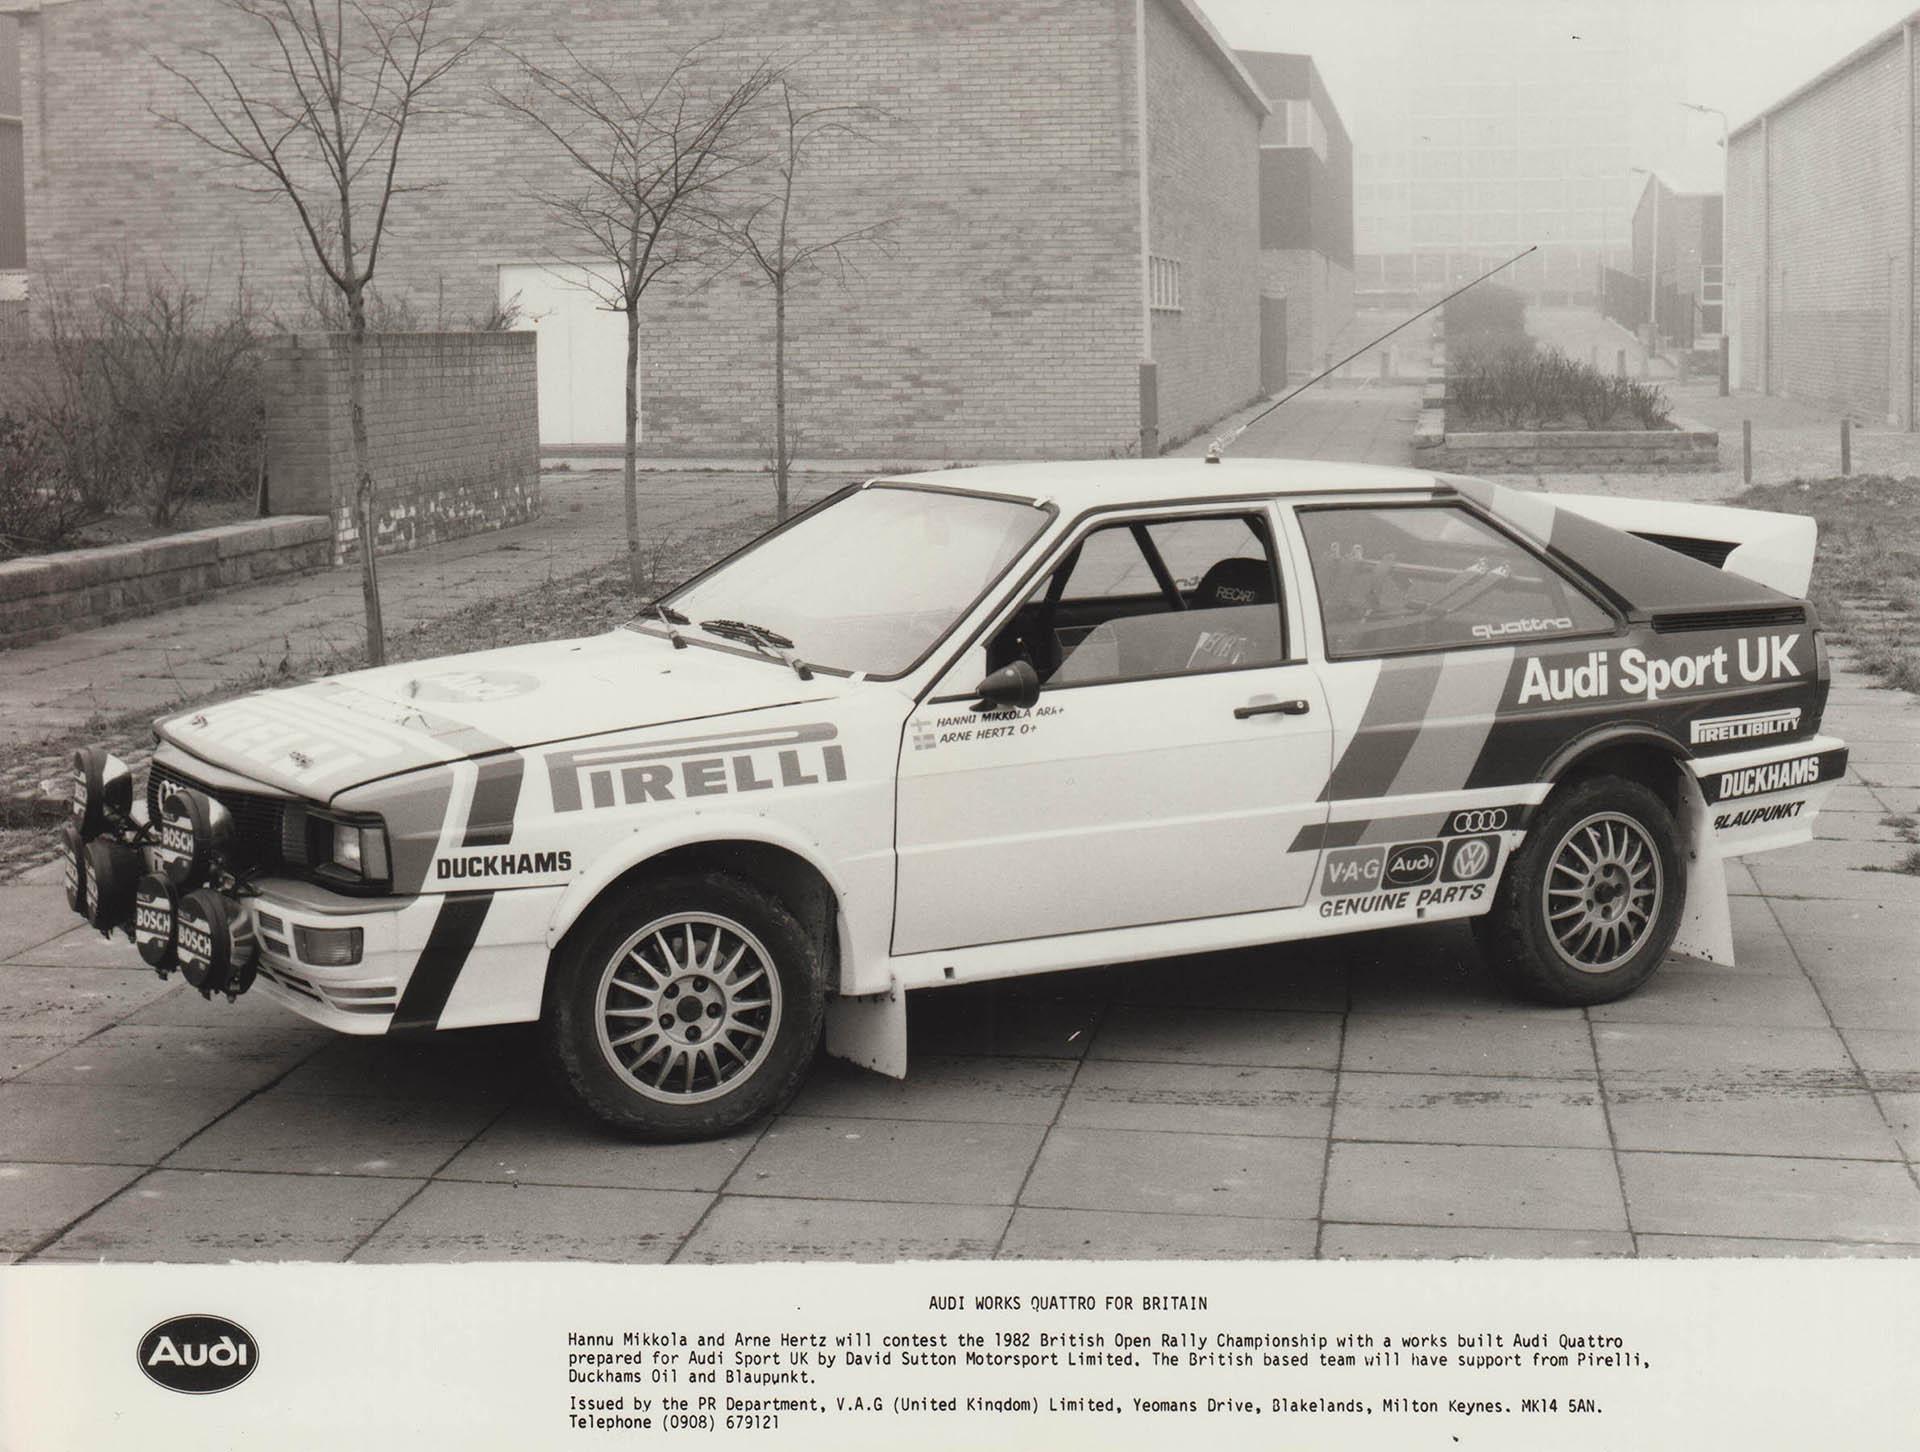 Audi Sport UK Press Release 23/02/1982